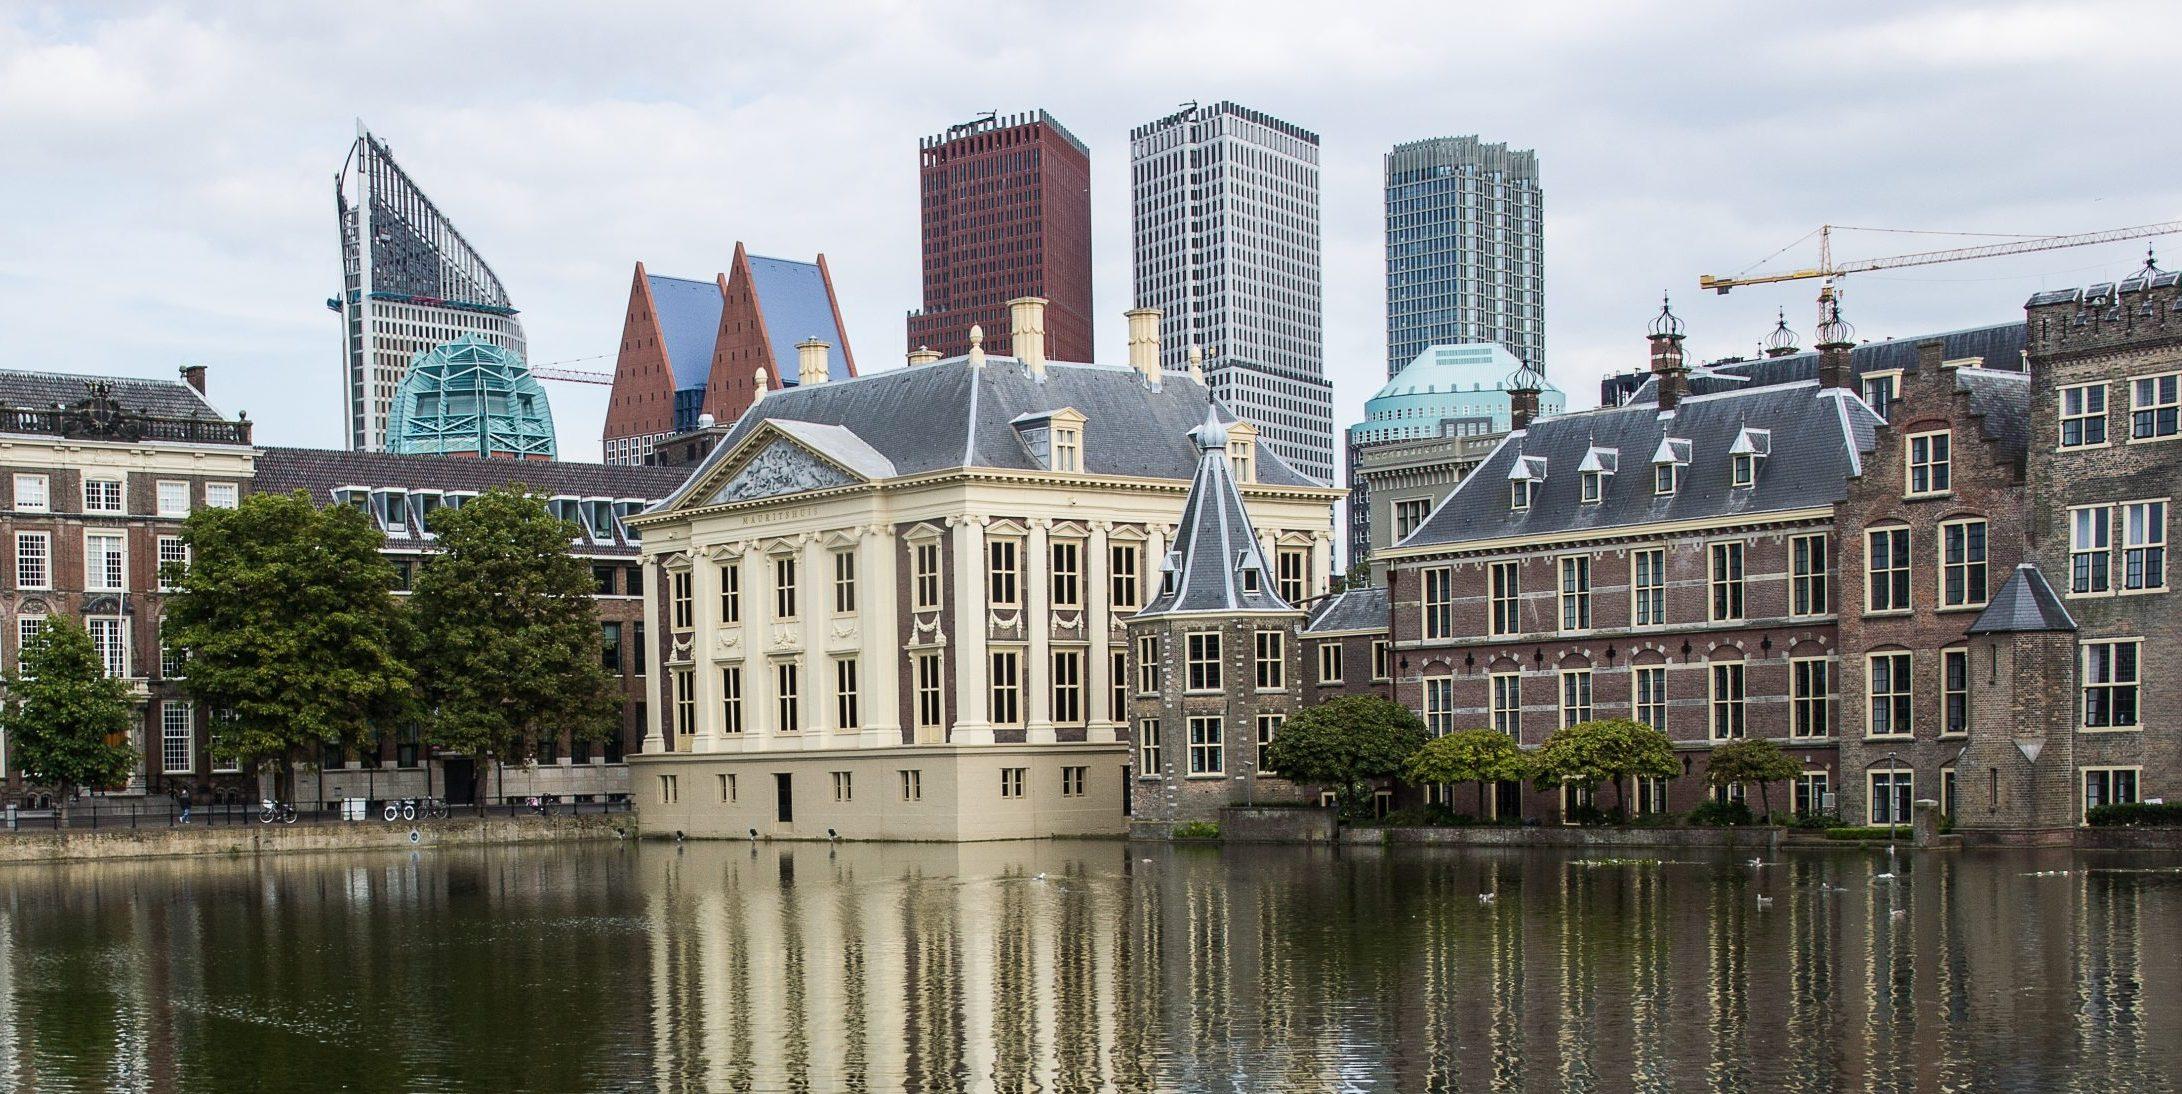 Den Haag (mooi he)